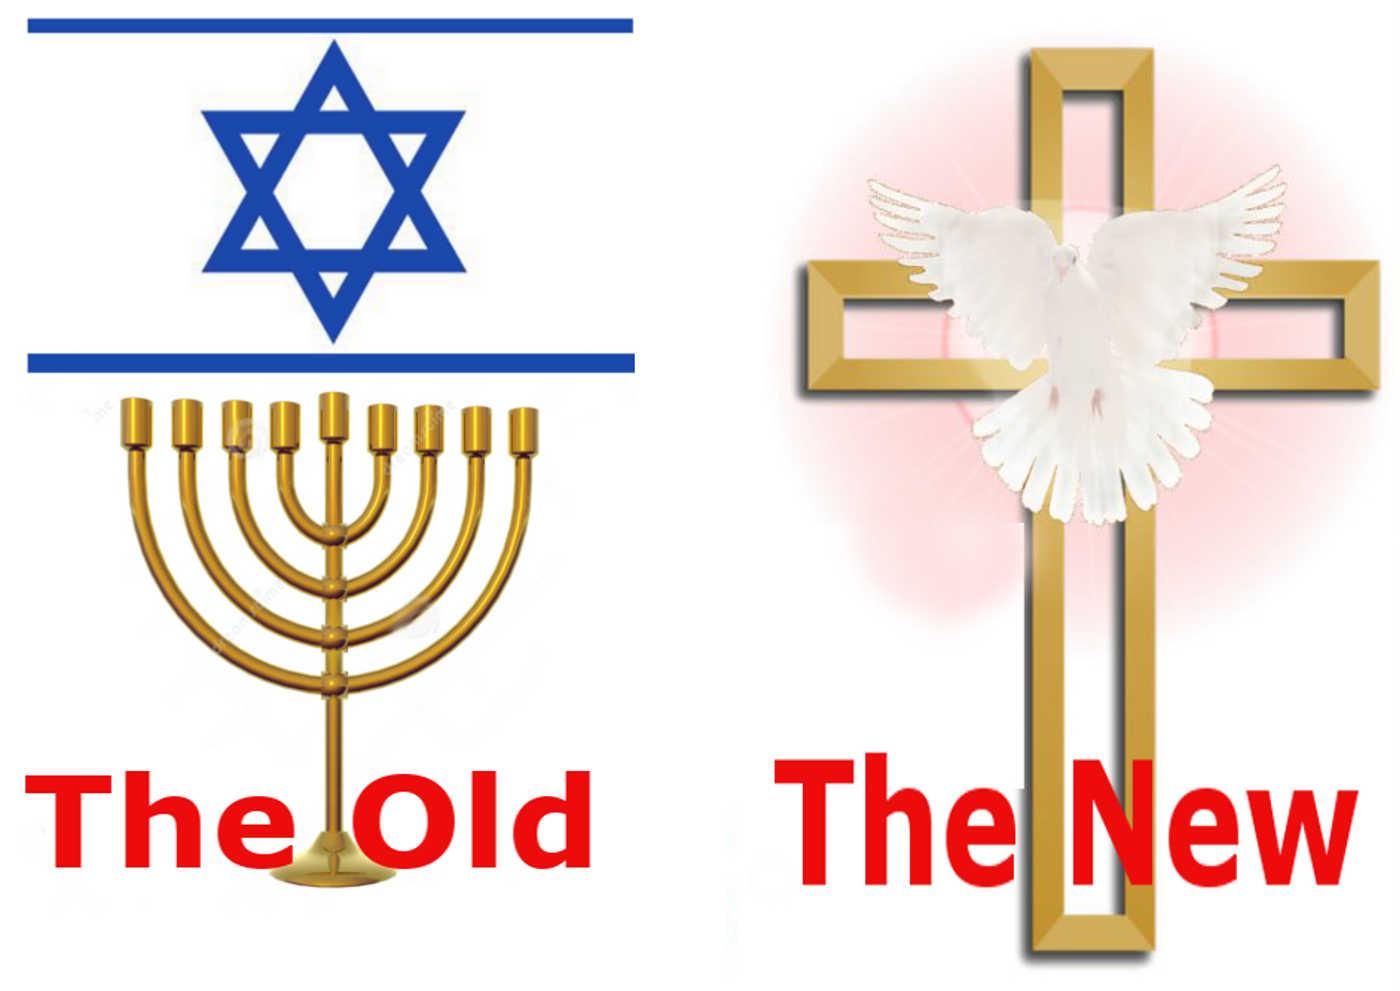 The Bible Old Testament Vs New Testament